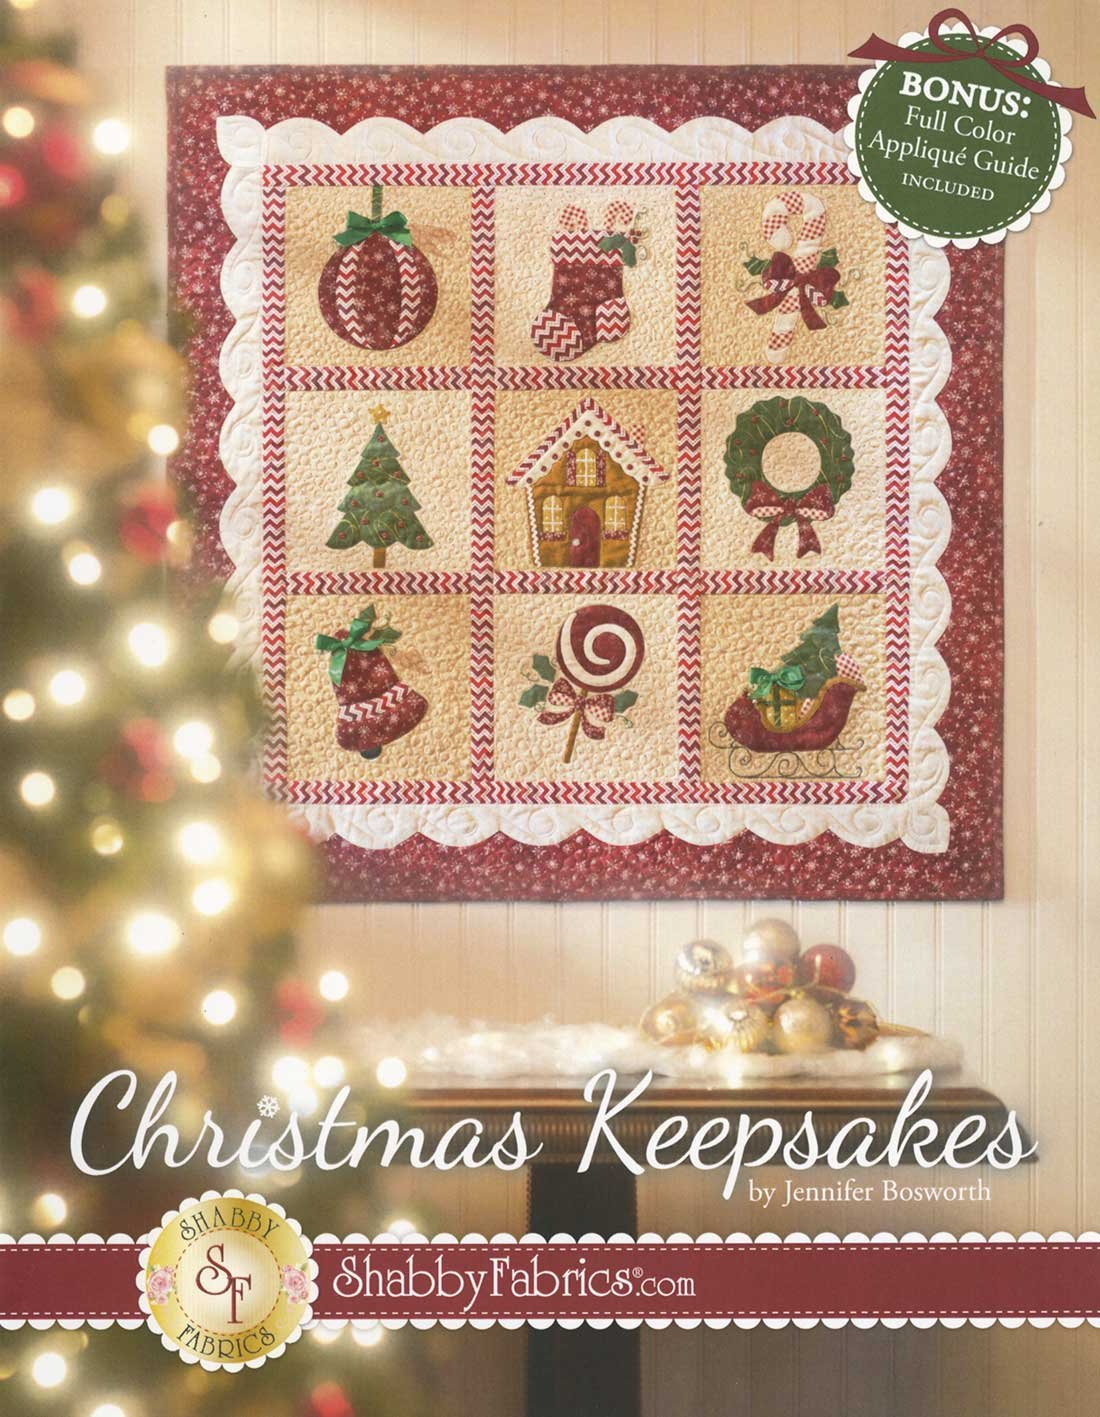 Christmas Keepsakes/wall hanging, 36x36-SKU#SF48644